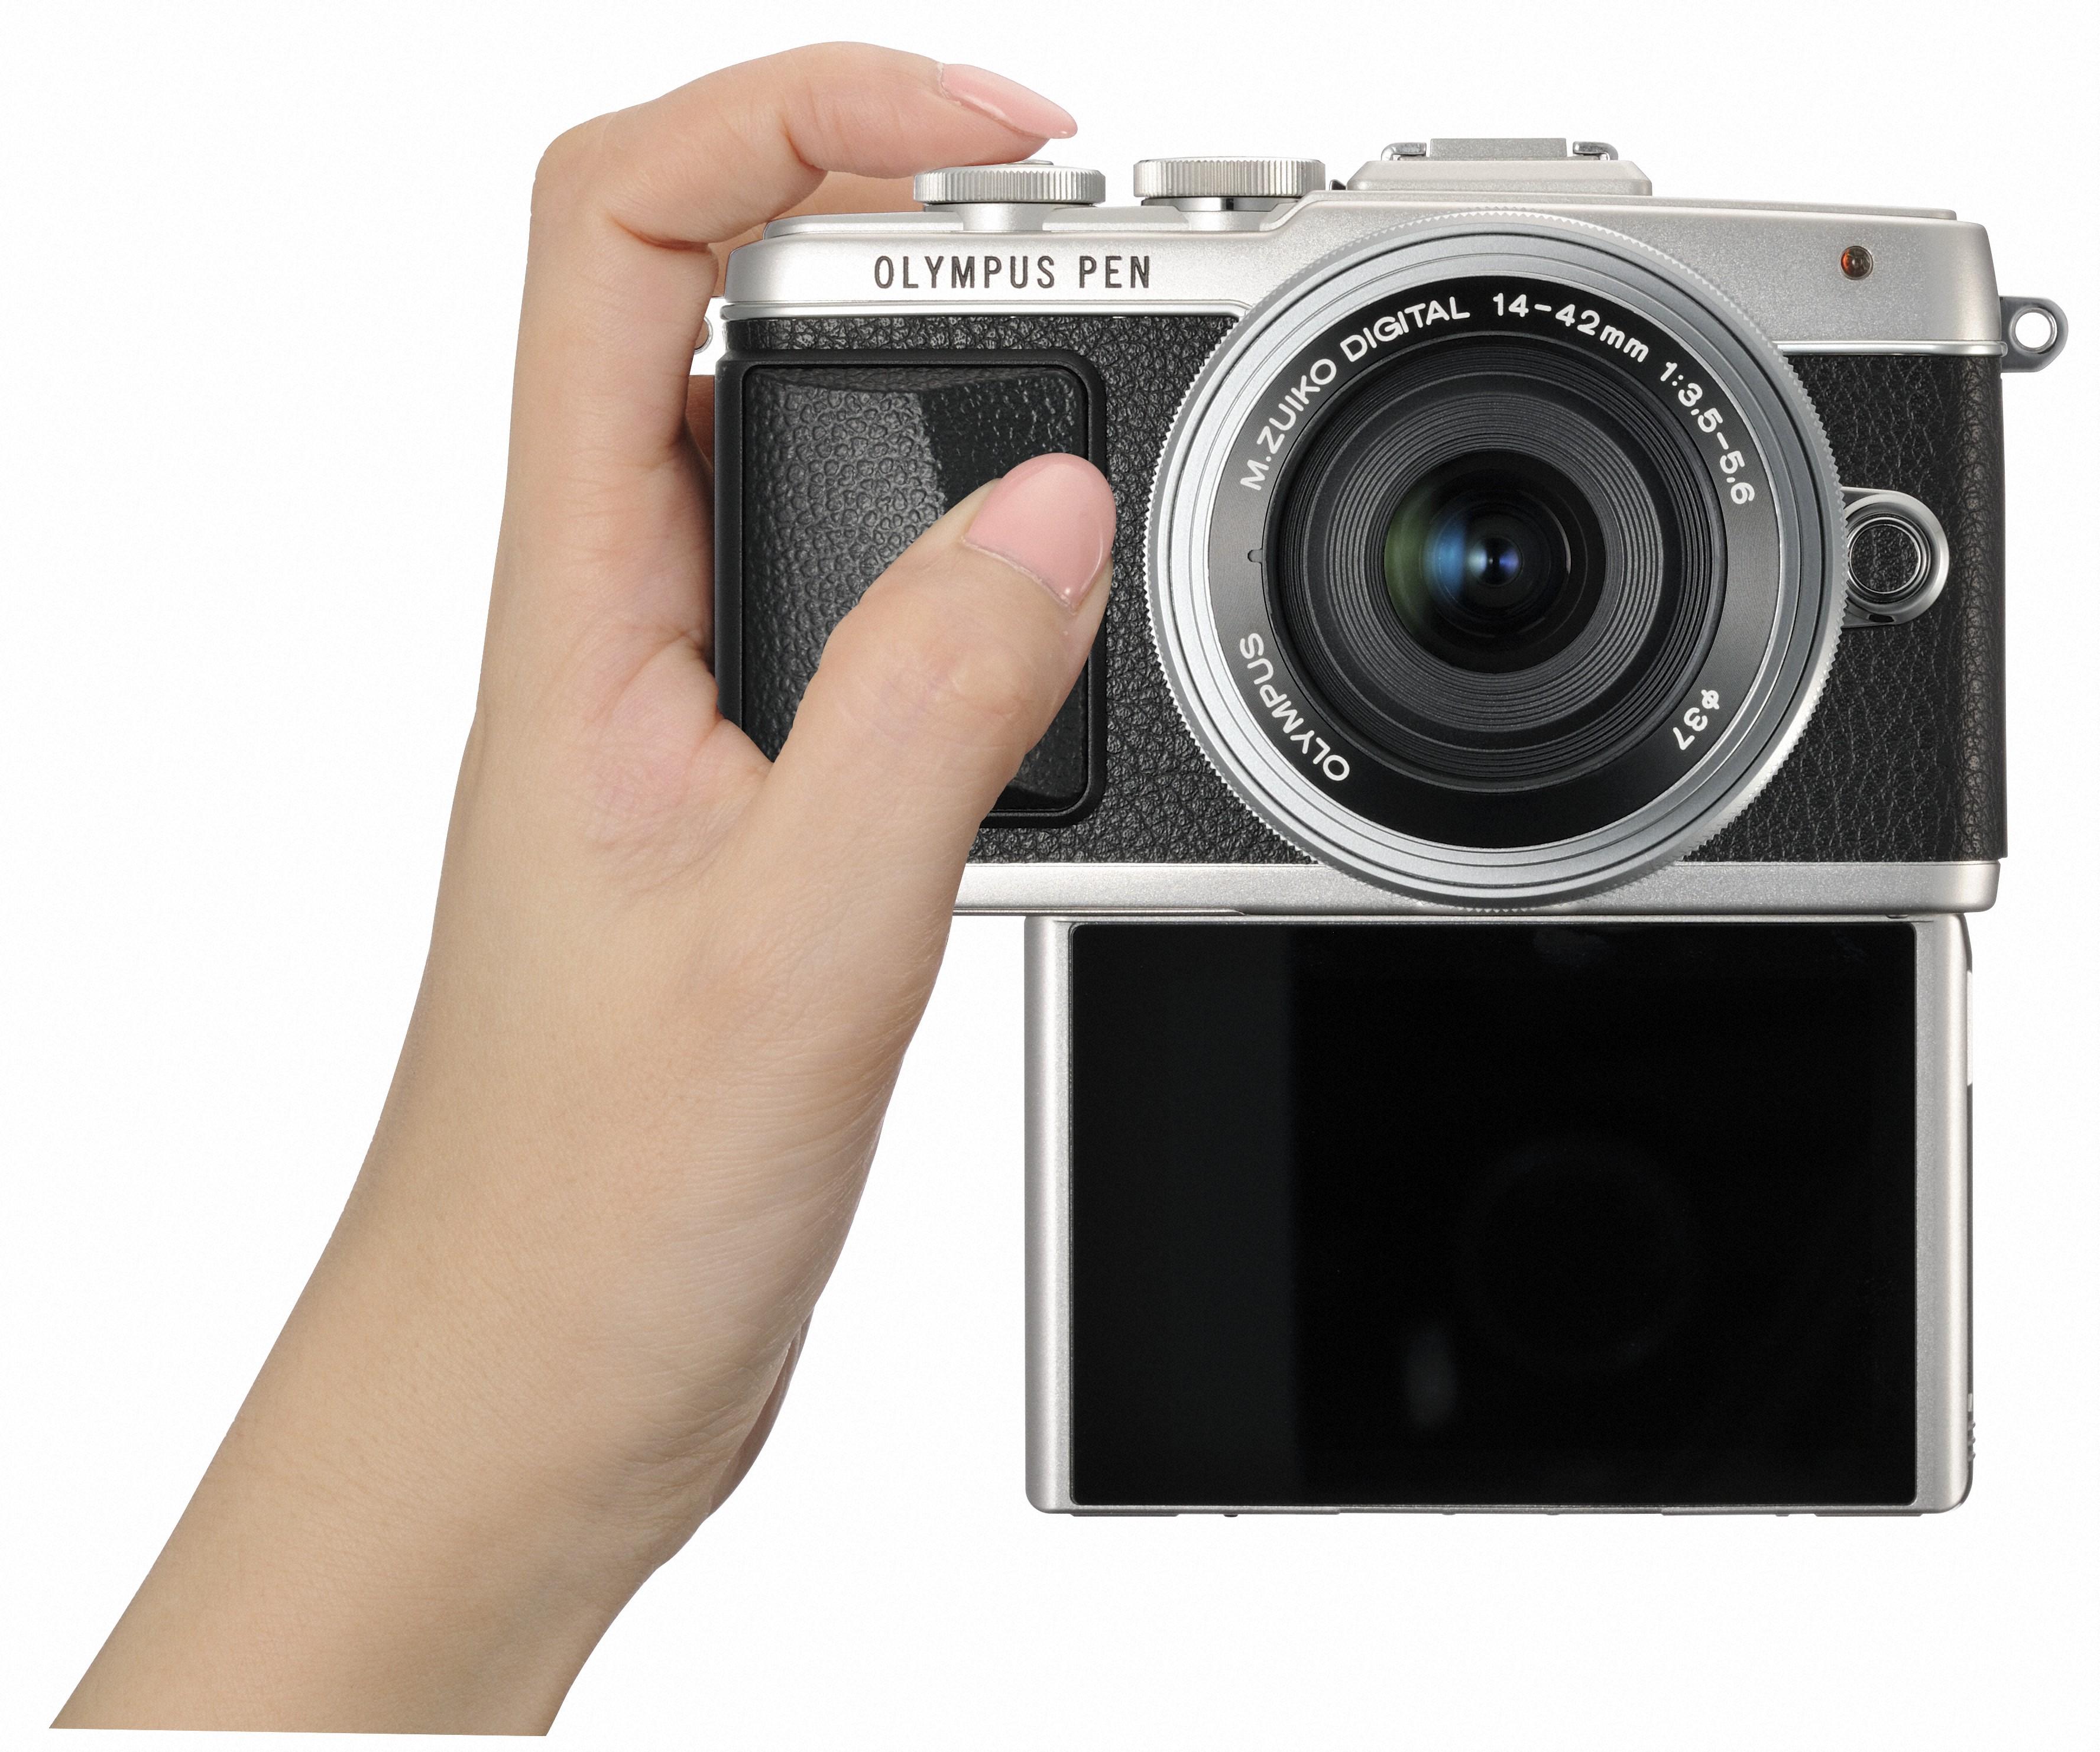 The Olympus E-PL7 is definitely selfie friendly